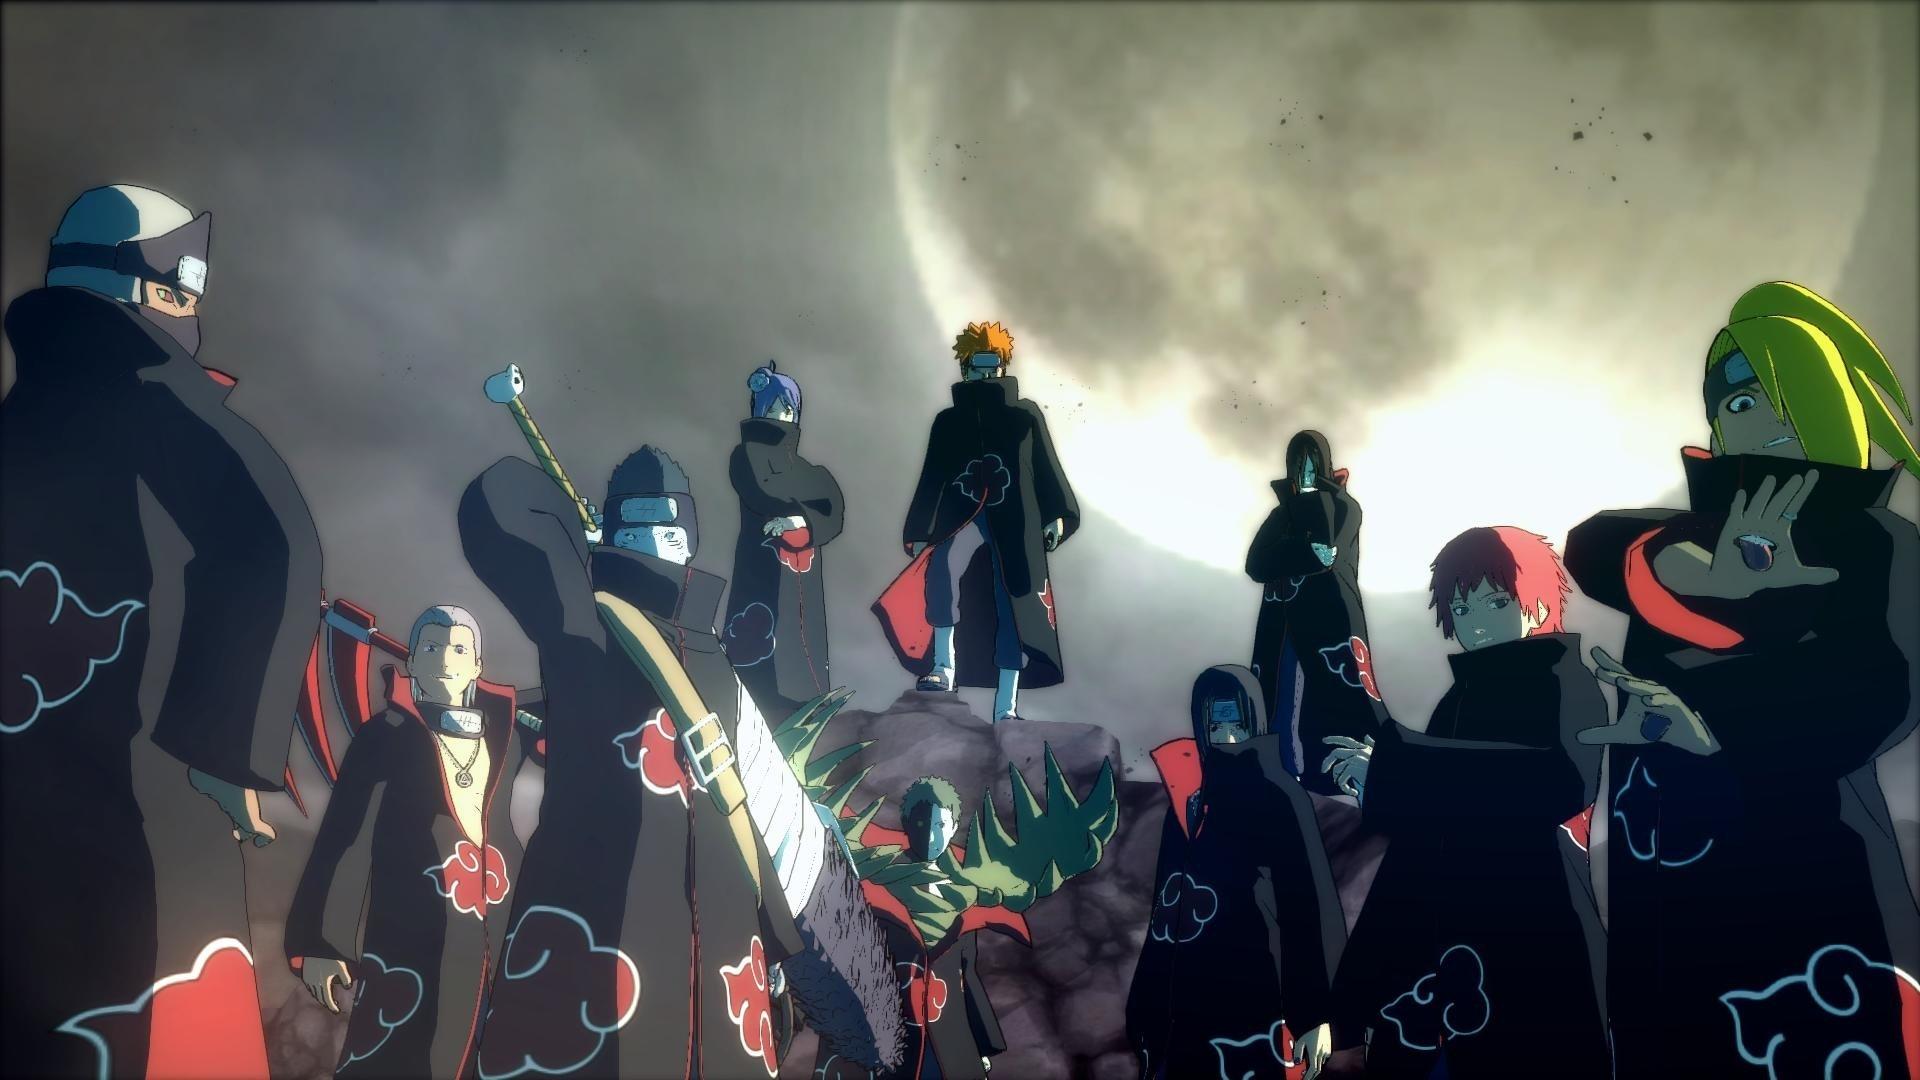 Akatsuki-Naruto-HD-Backgrounds-wallpaper-wp3602312